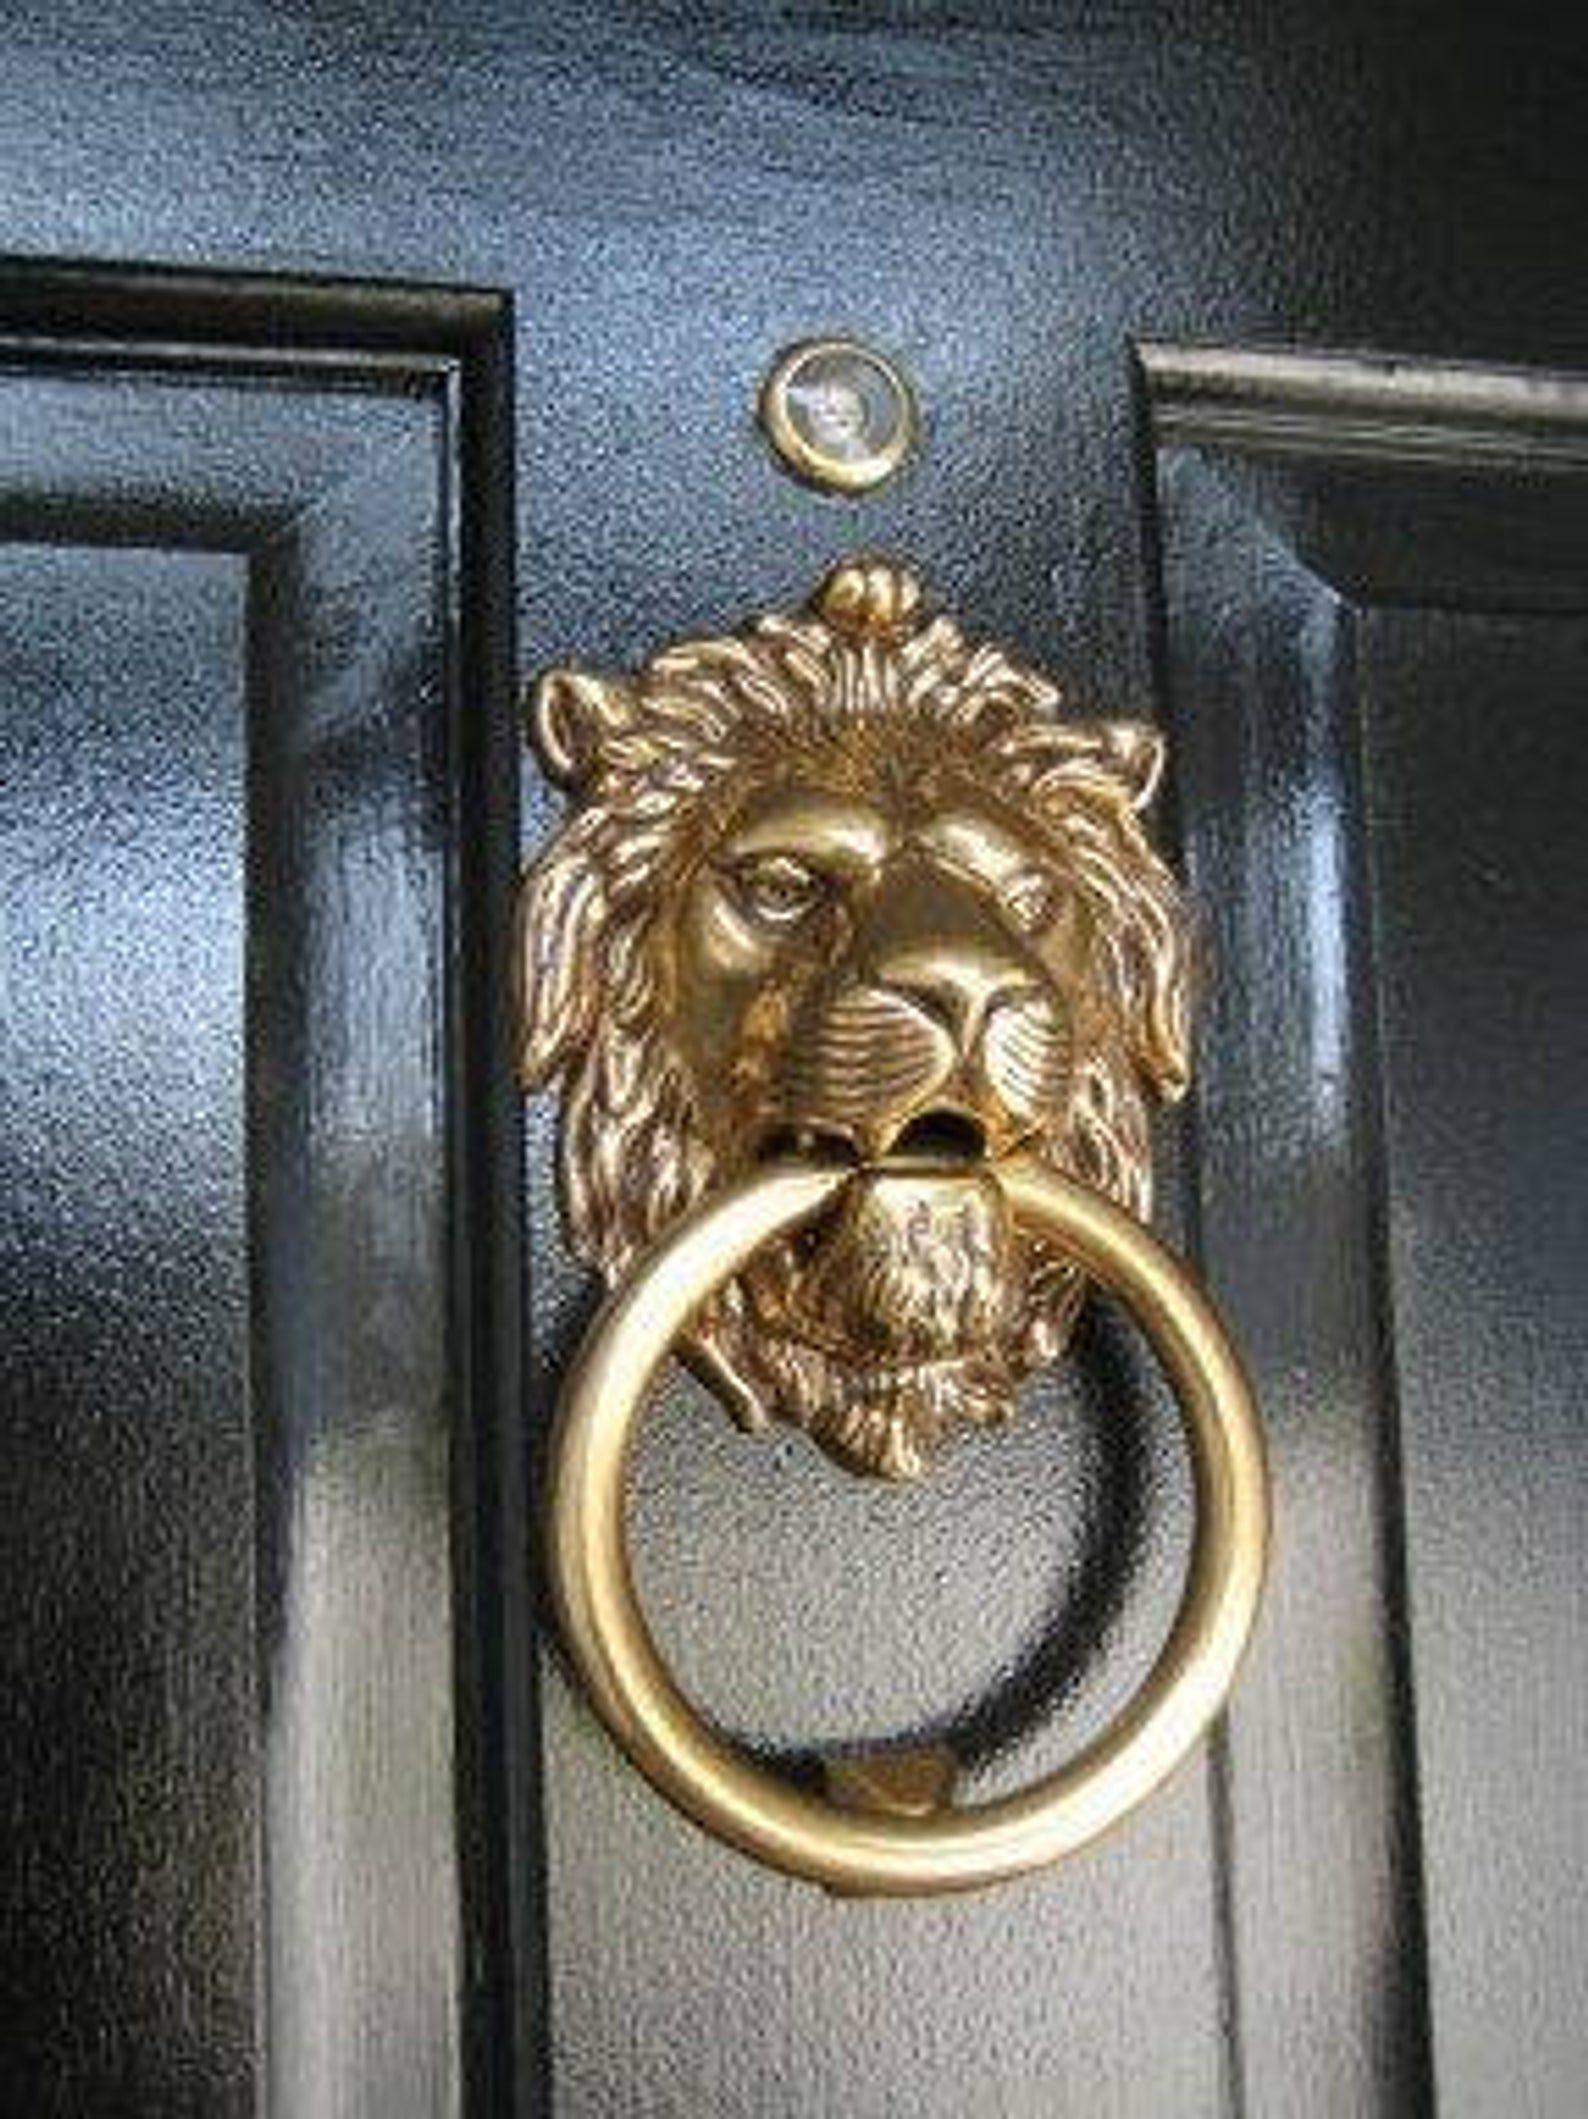 Brass lion head door knocker & Brass Lion Head Door Knocker - Foter